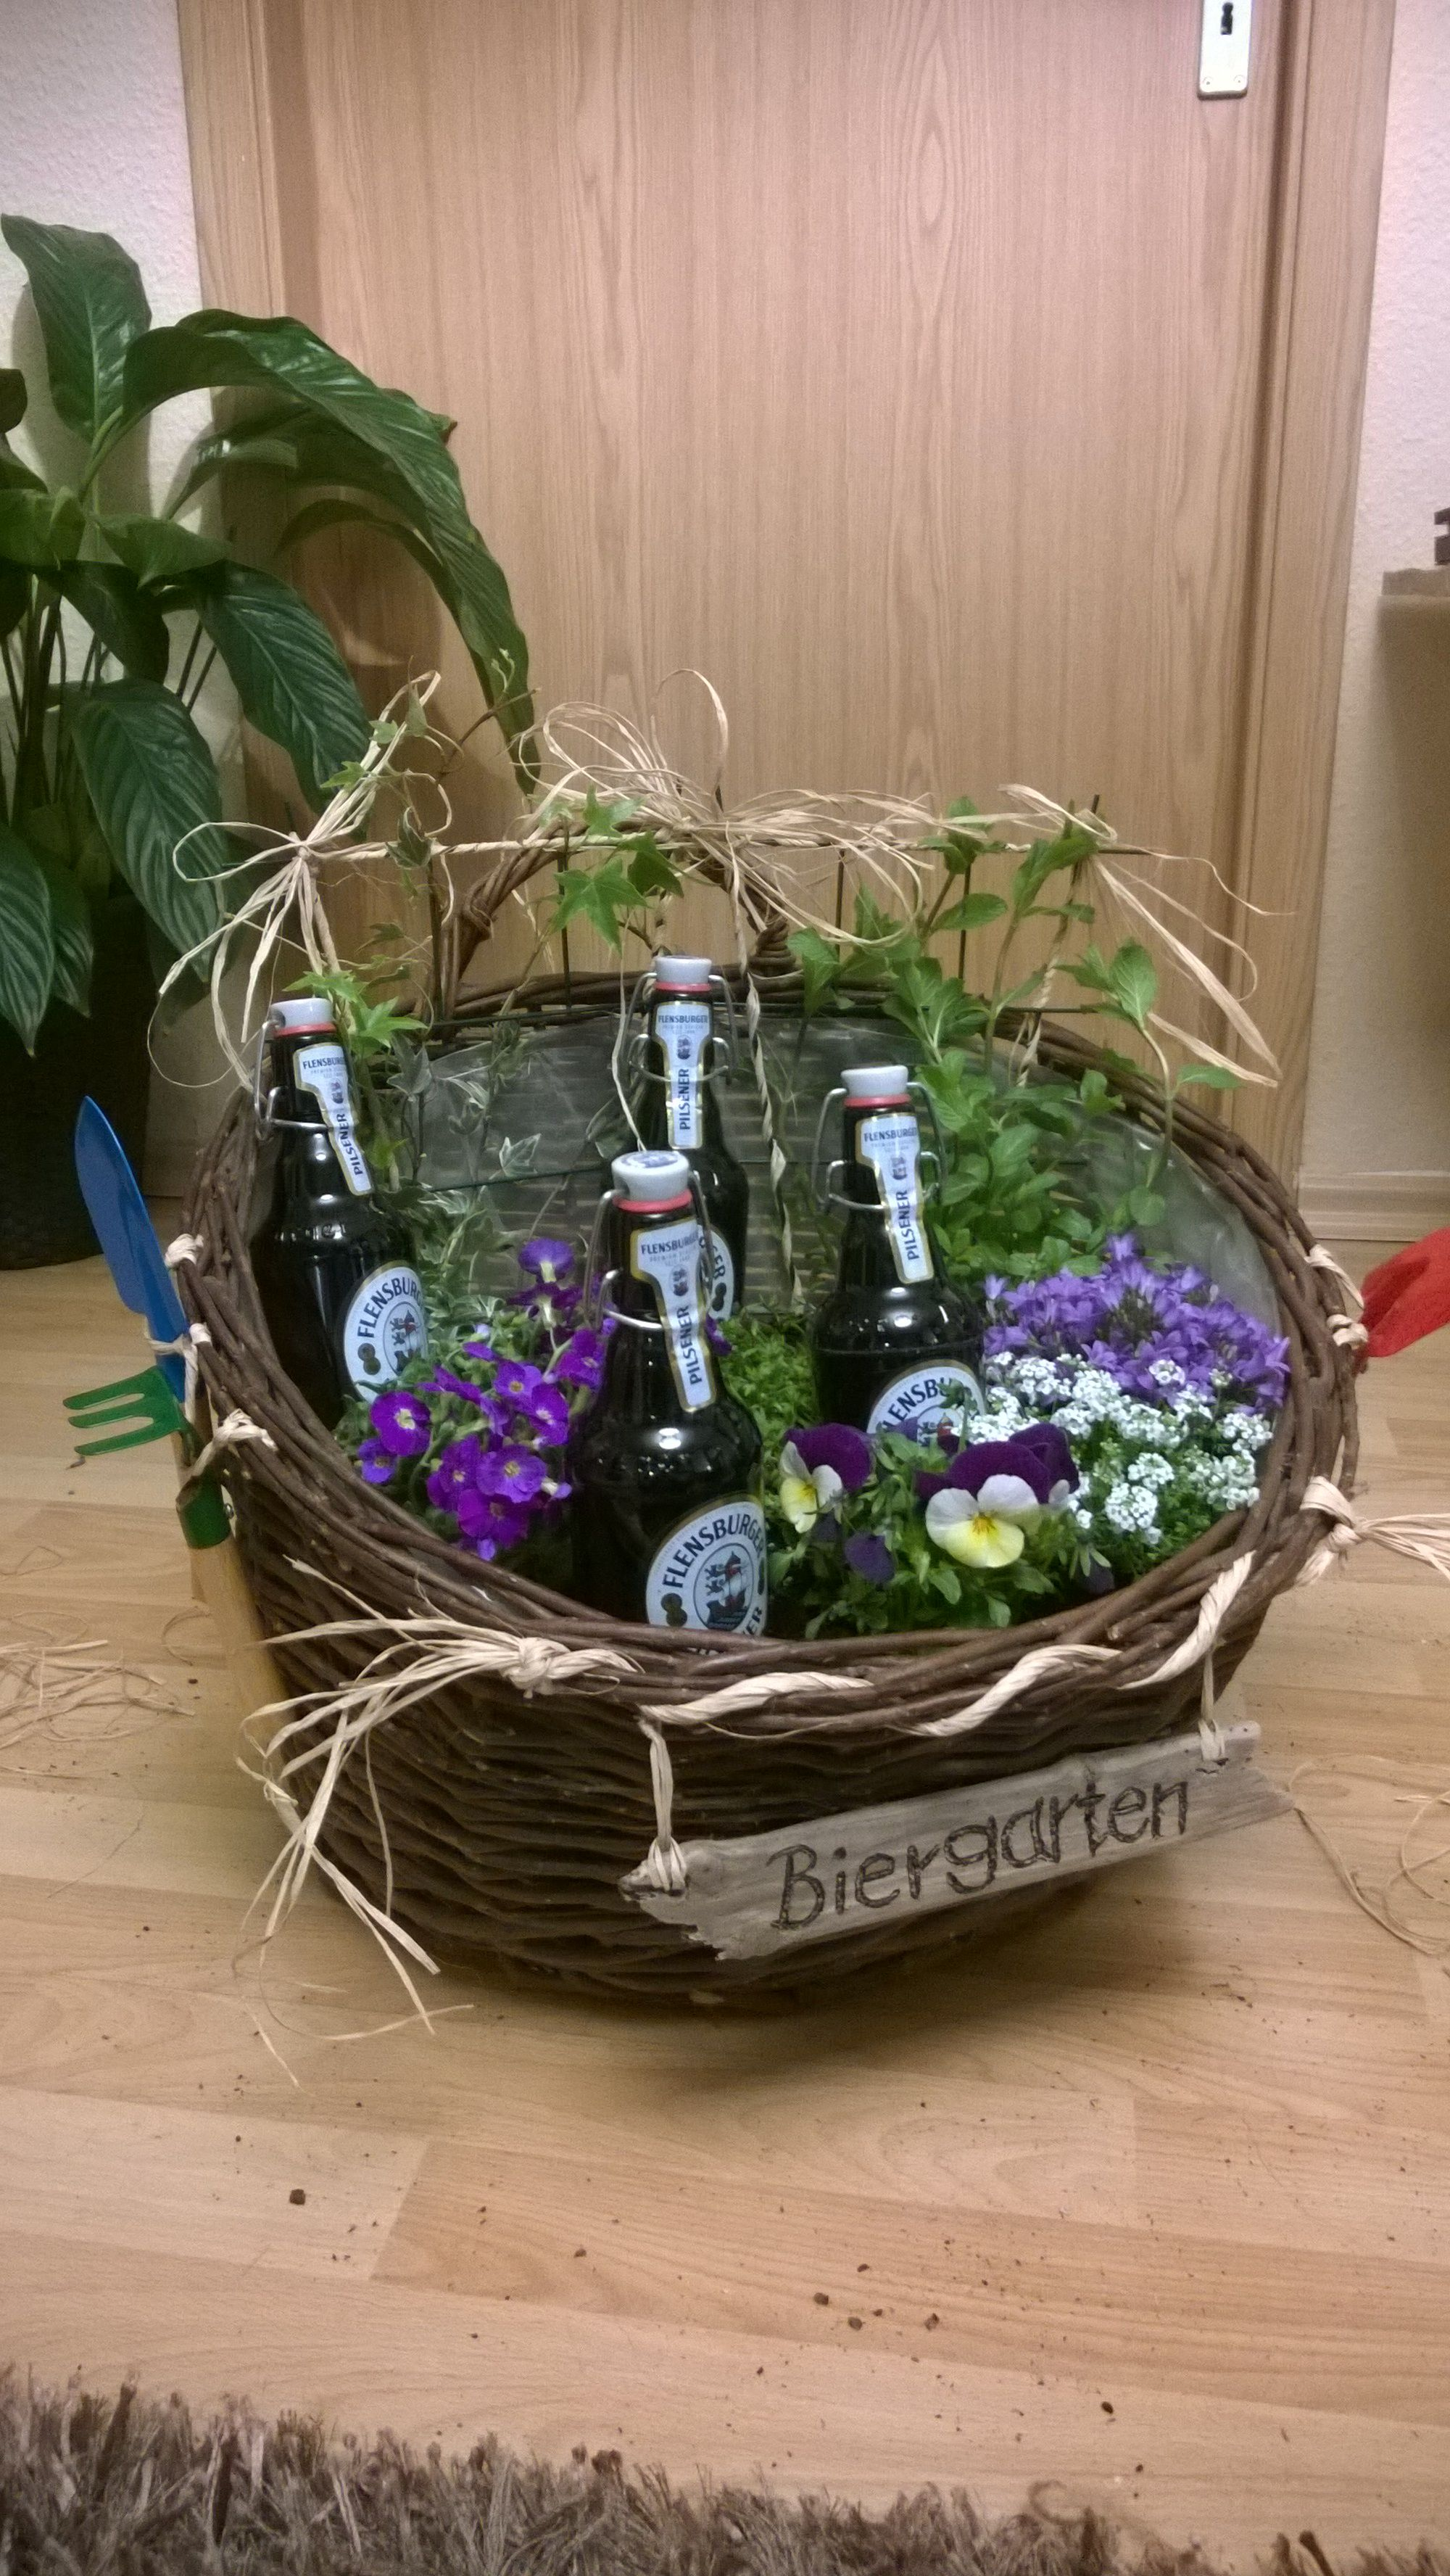 Biergarten Blumen Geschenk Blumenkorb Flensburger